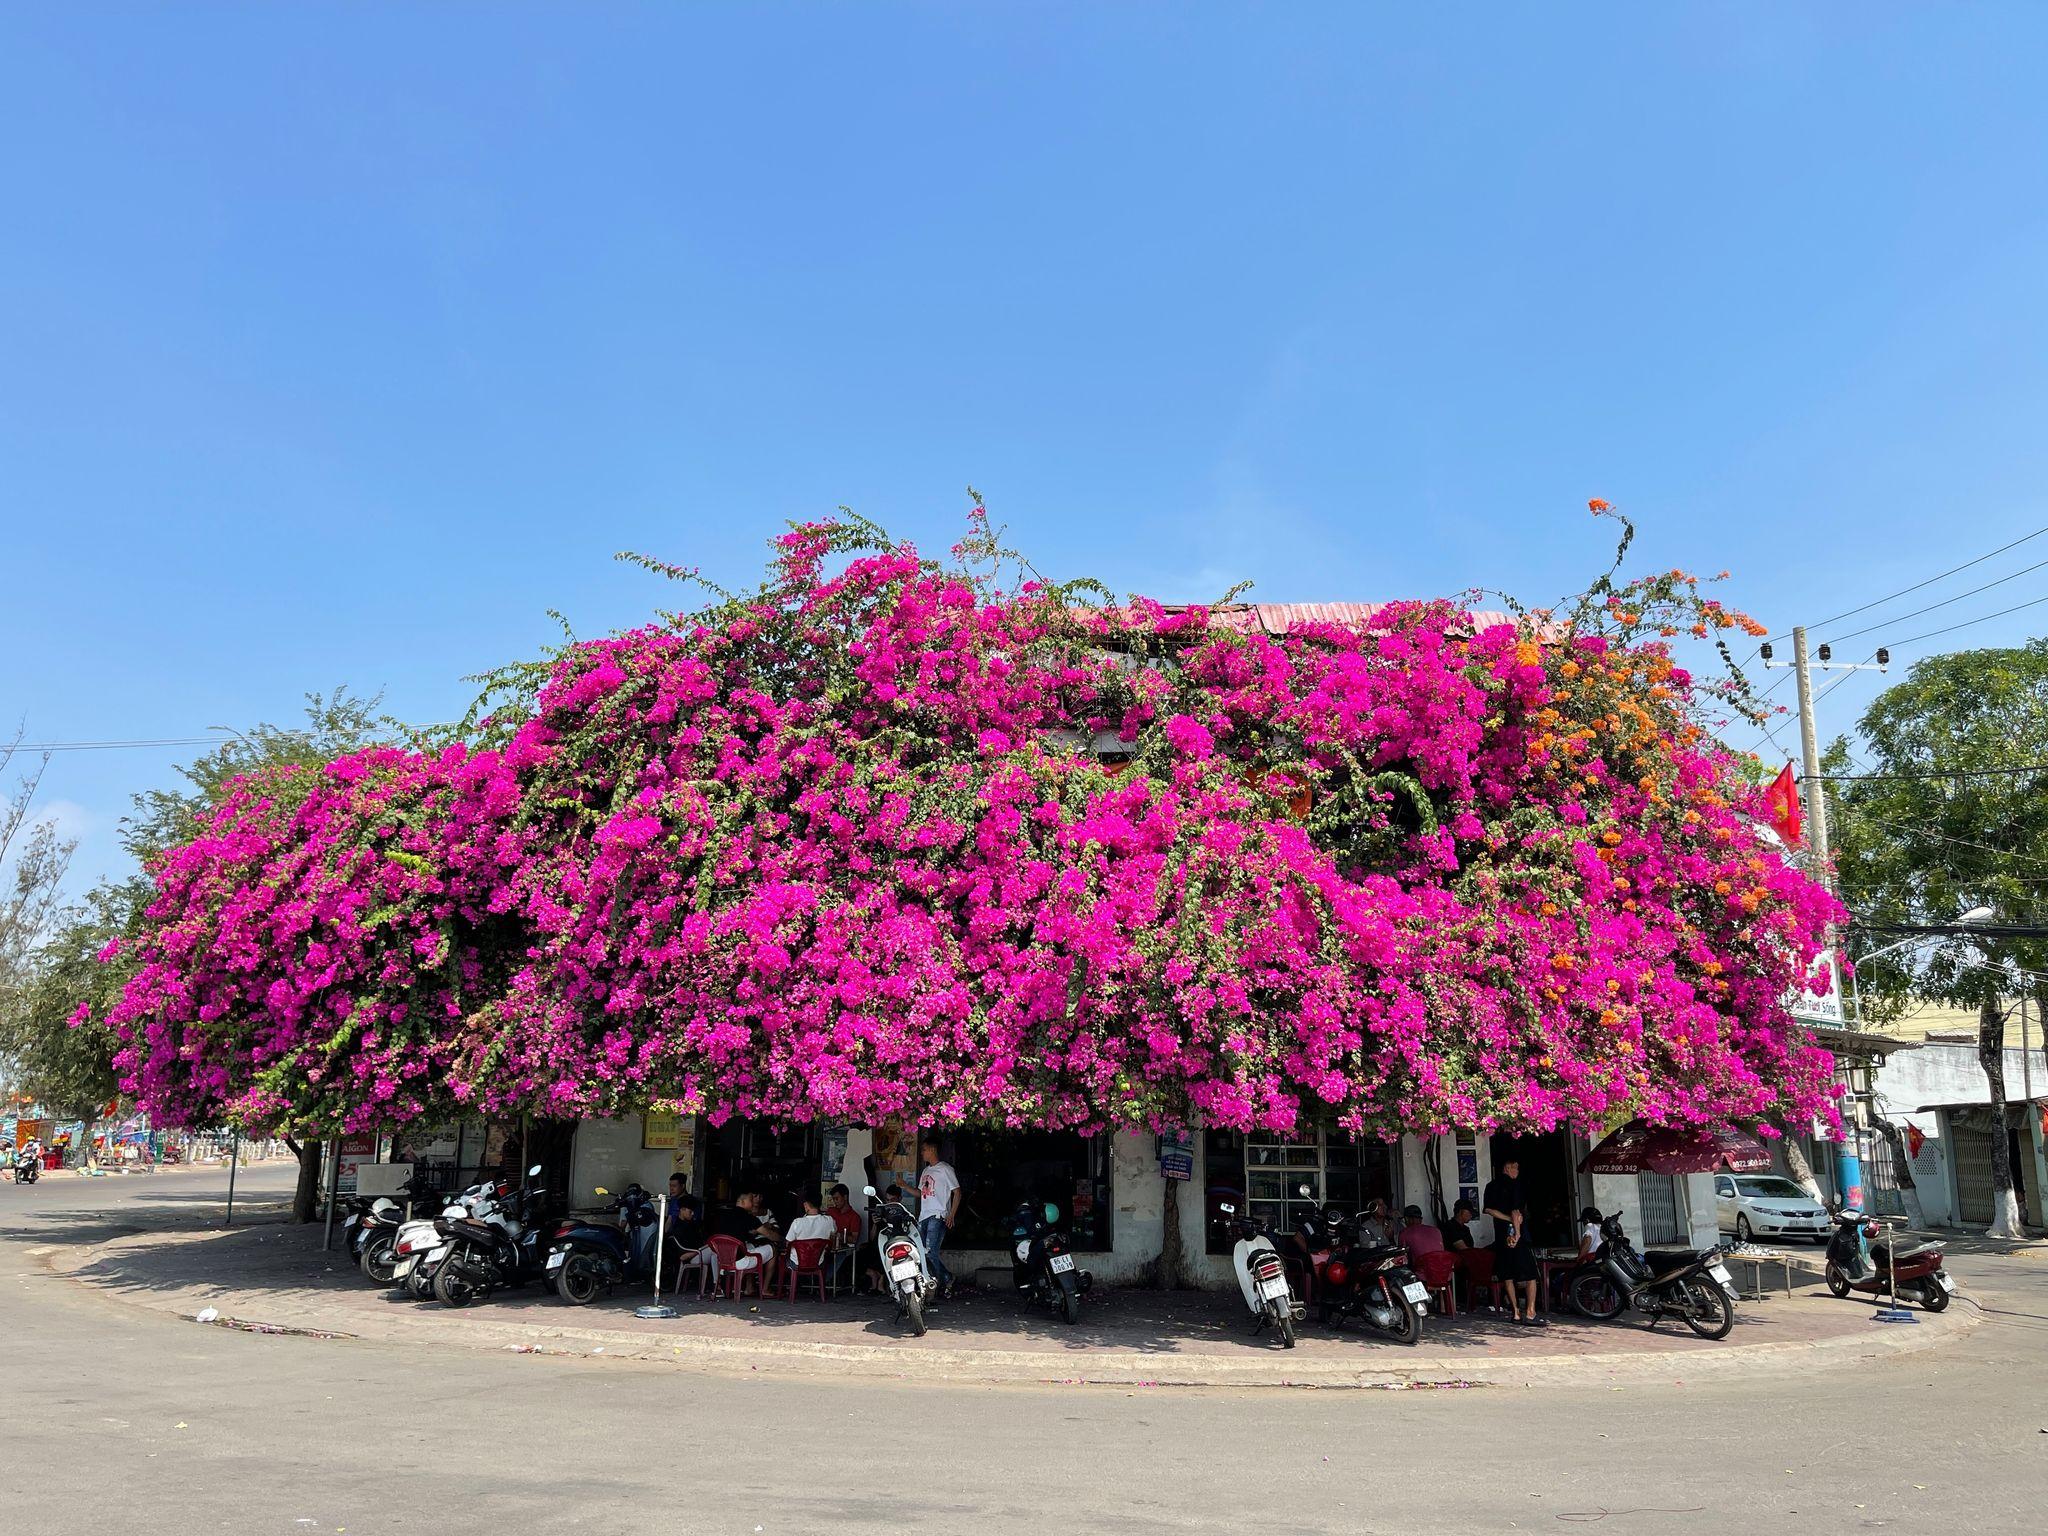 Bougainvillea in full bloom: A must-see in Vietnam's coastal Phan Thiet City